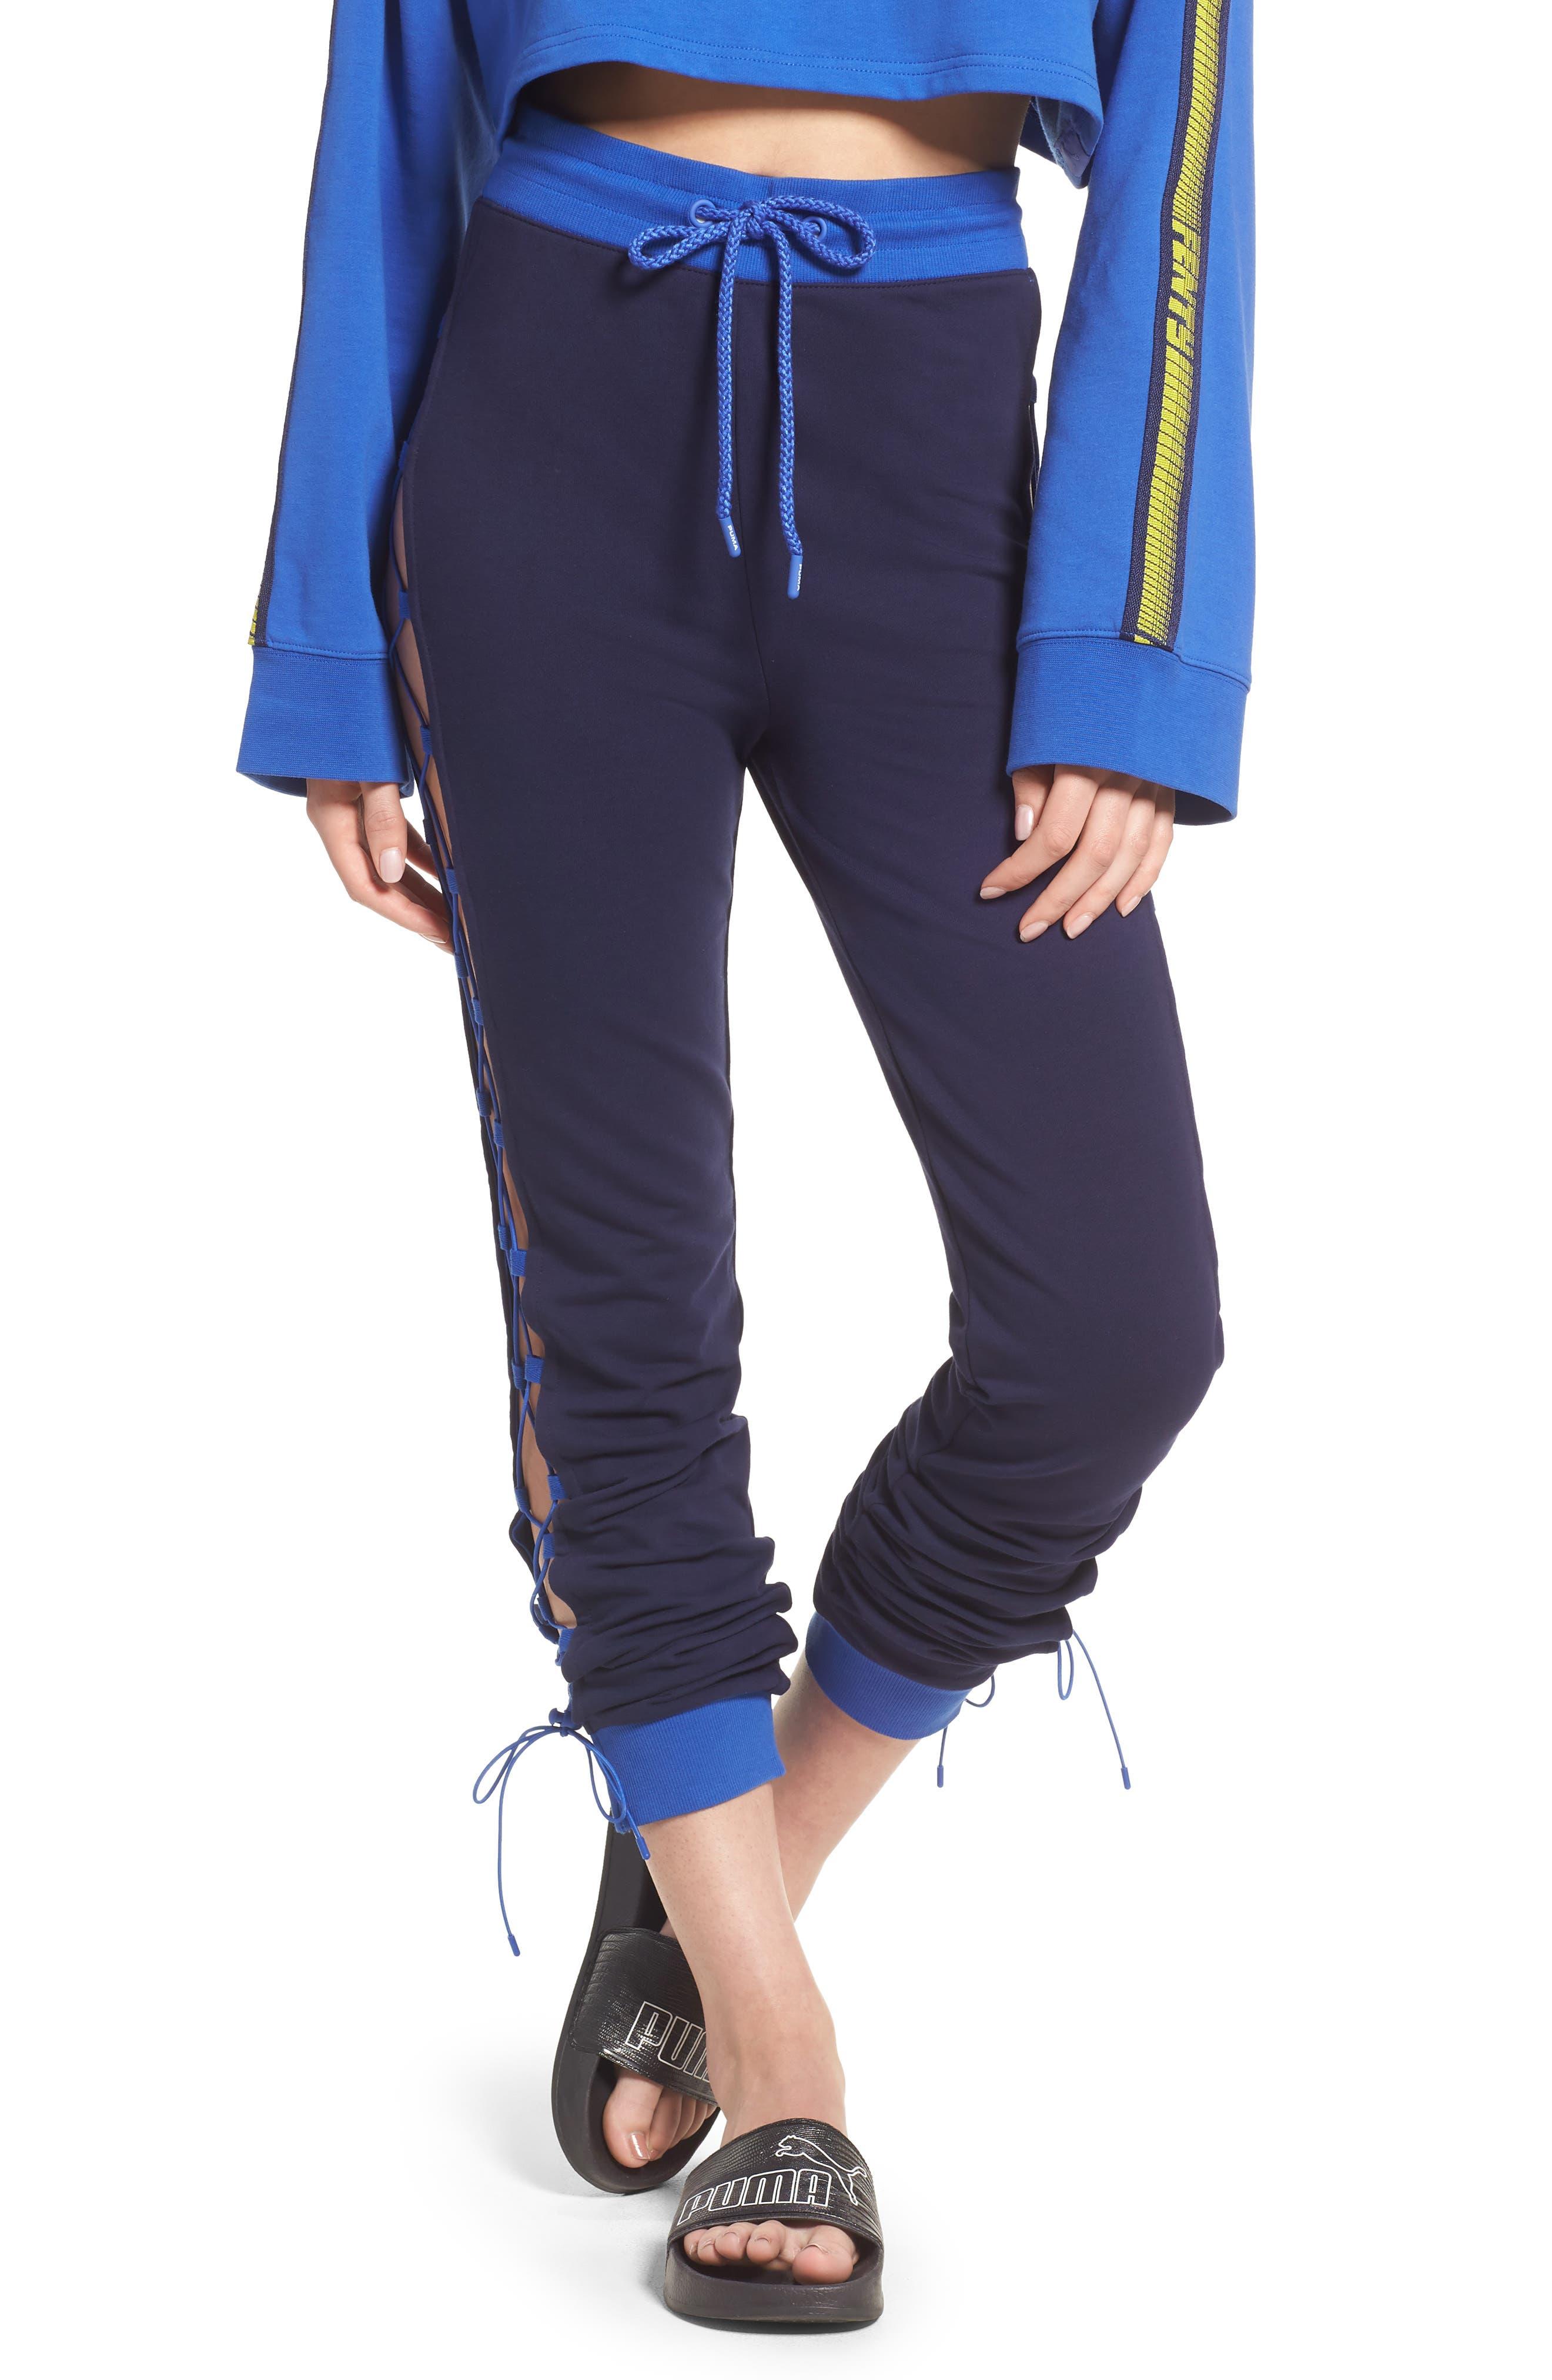 FENTY PUMA by Rihanna Lace-Up Sweatpants,                         Main,                         color, Evening Blue